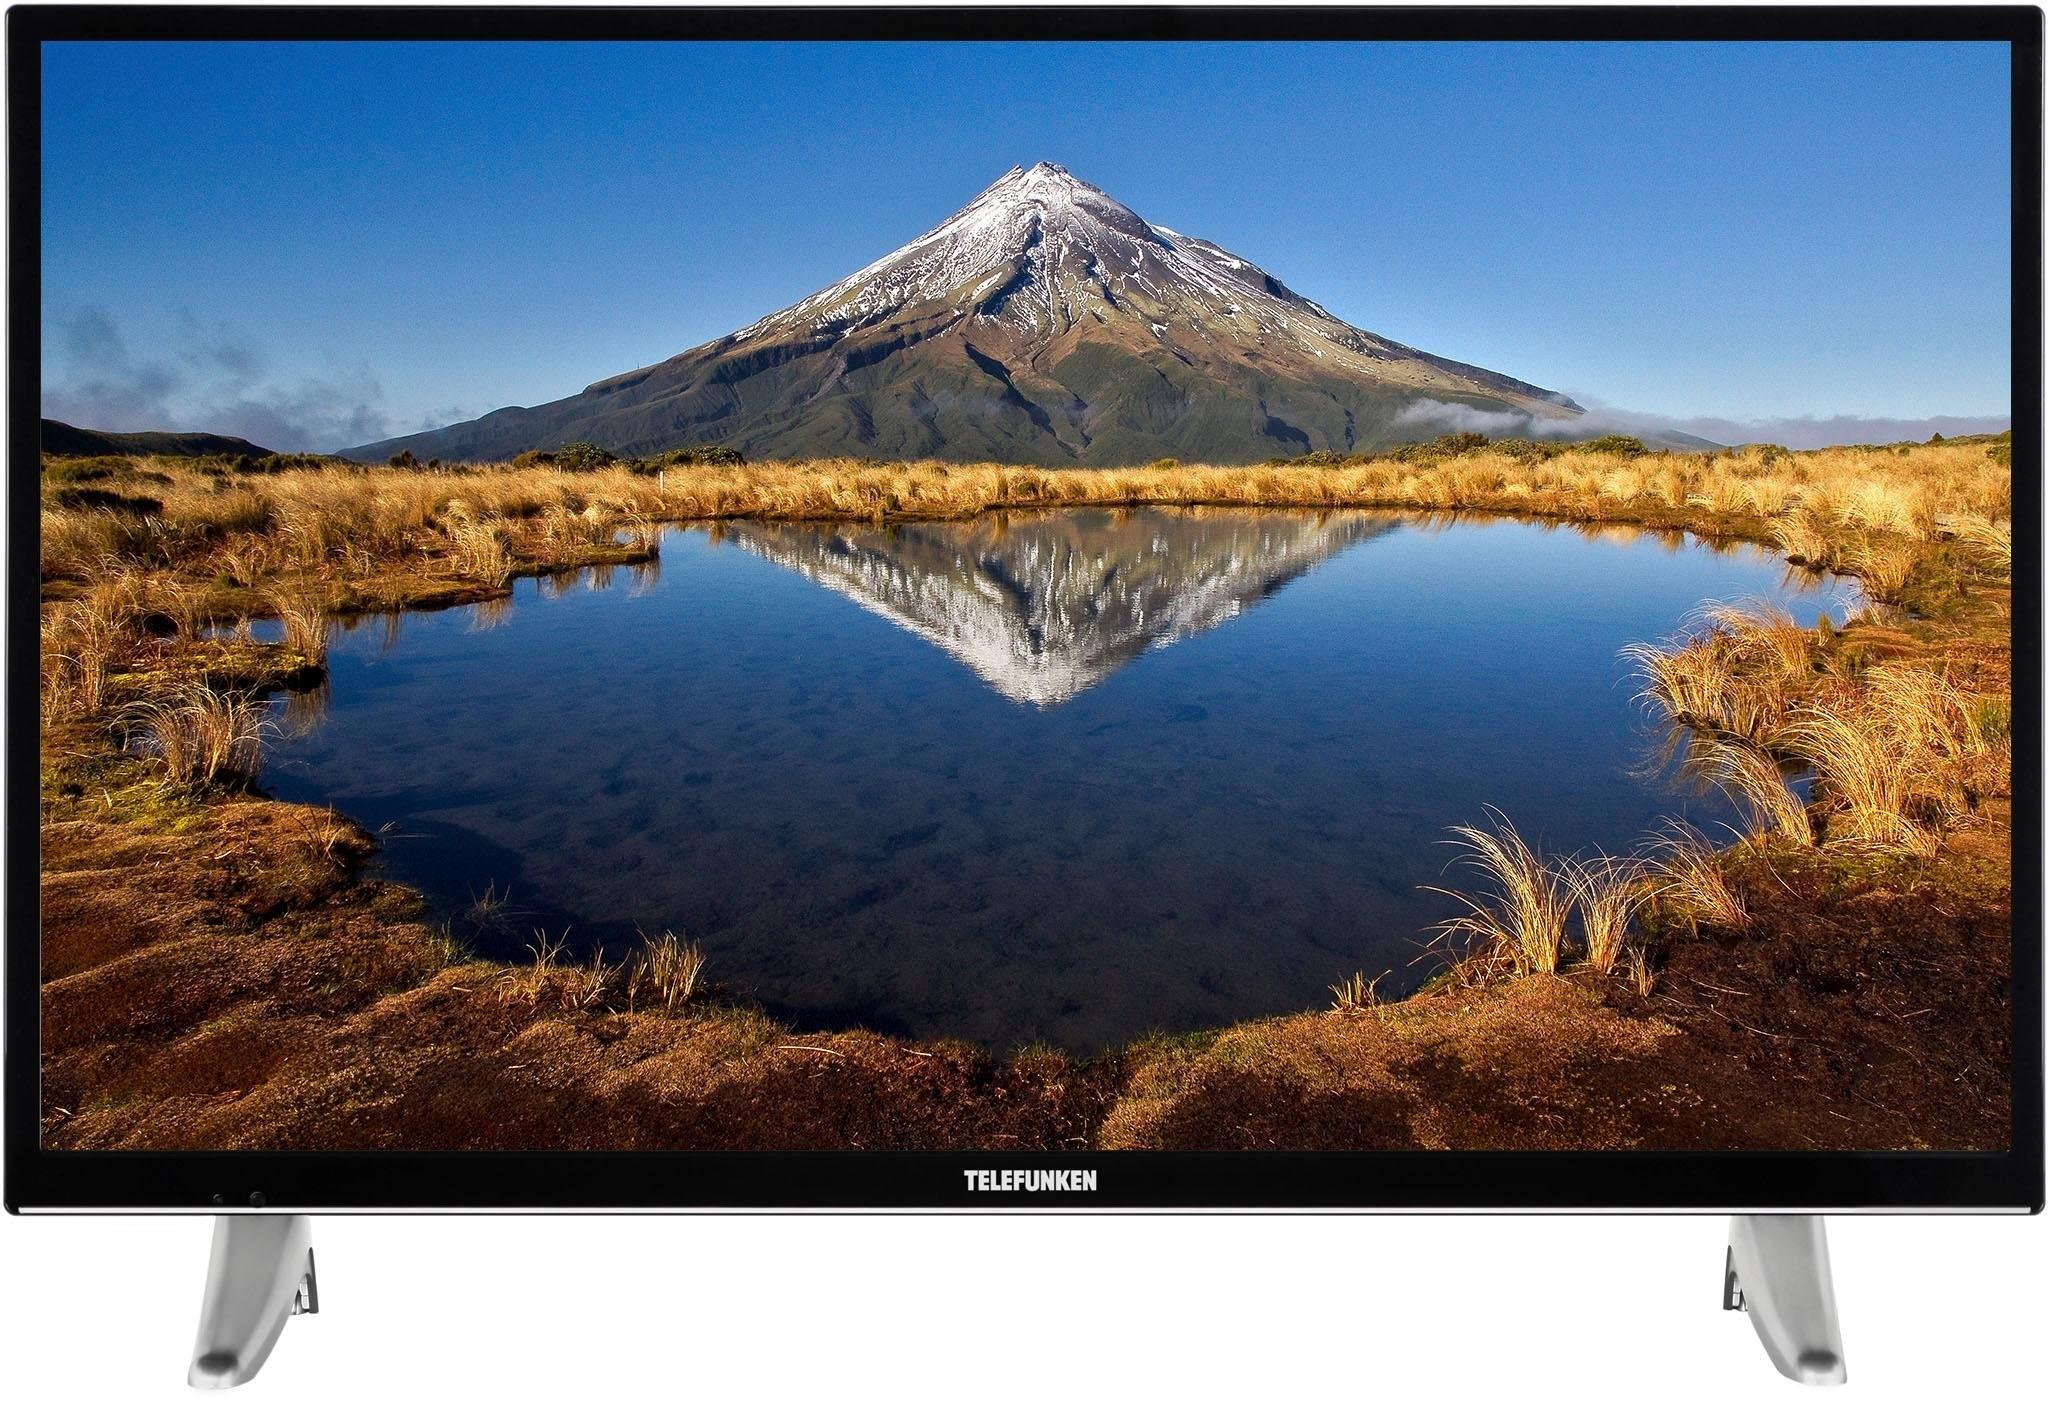 Telefunken OS-32H300 led-tv (81 cm / 32 inch), HD-ready, smart-tv nu online kopen bij OTTO